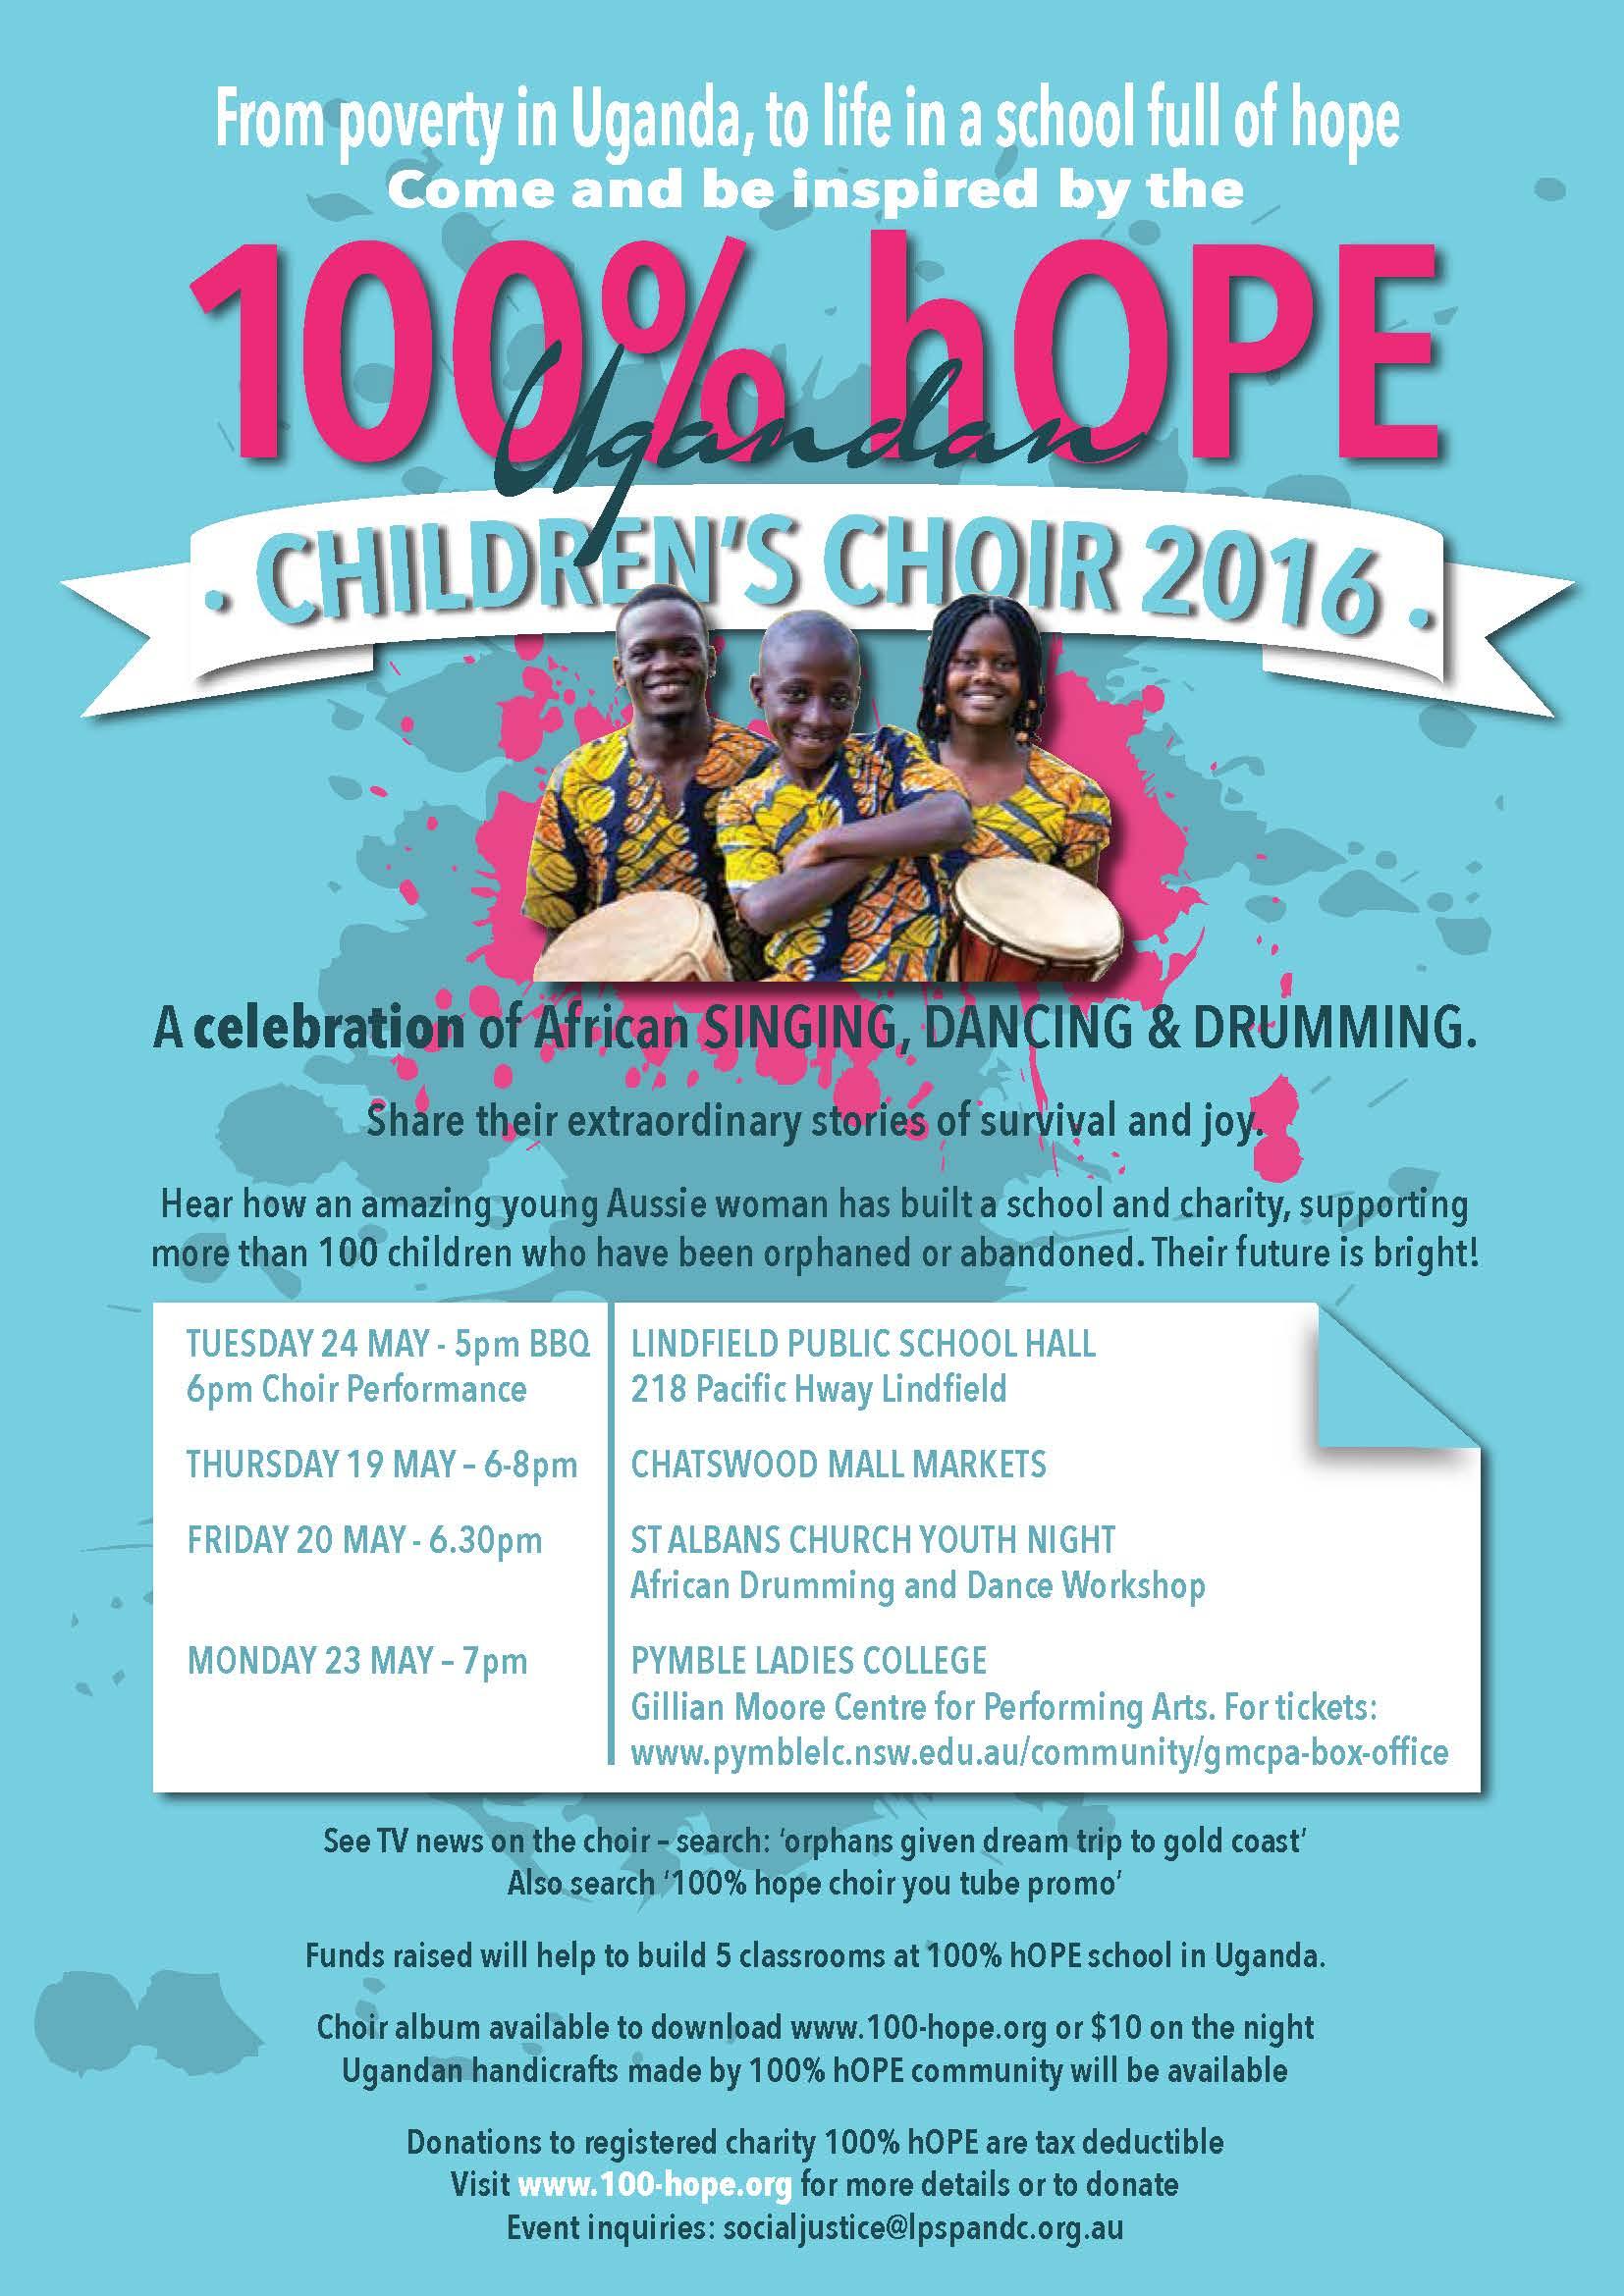 100% hOPE Choir visit flyer May 17